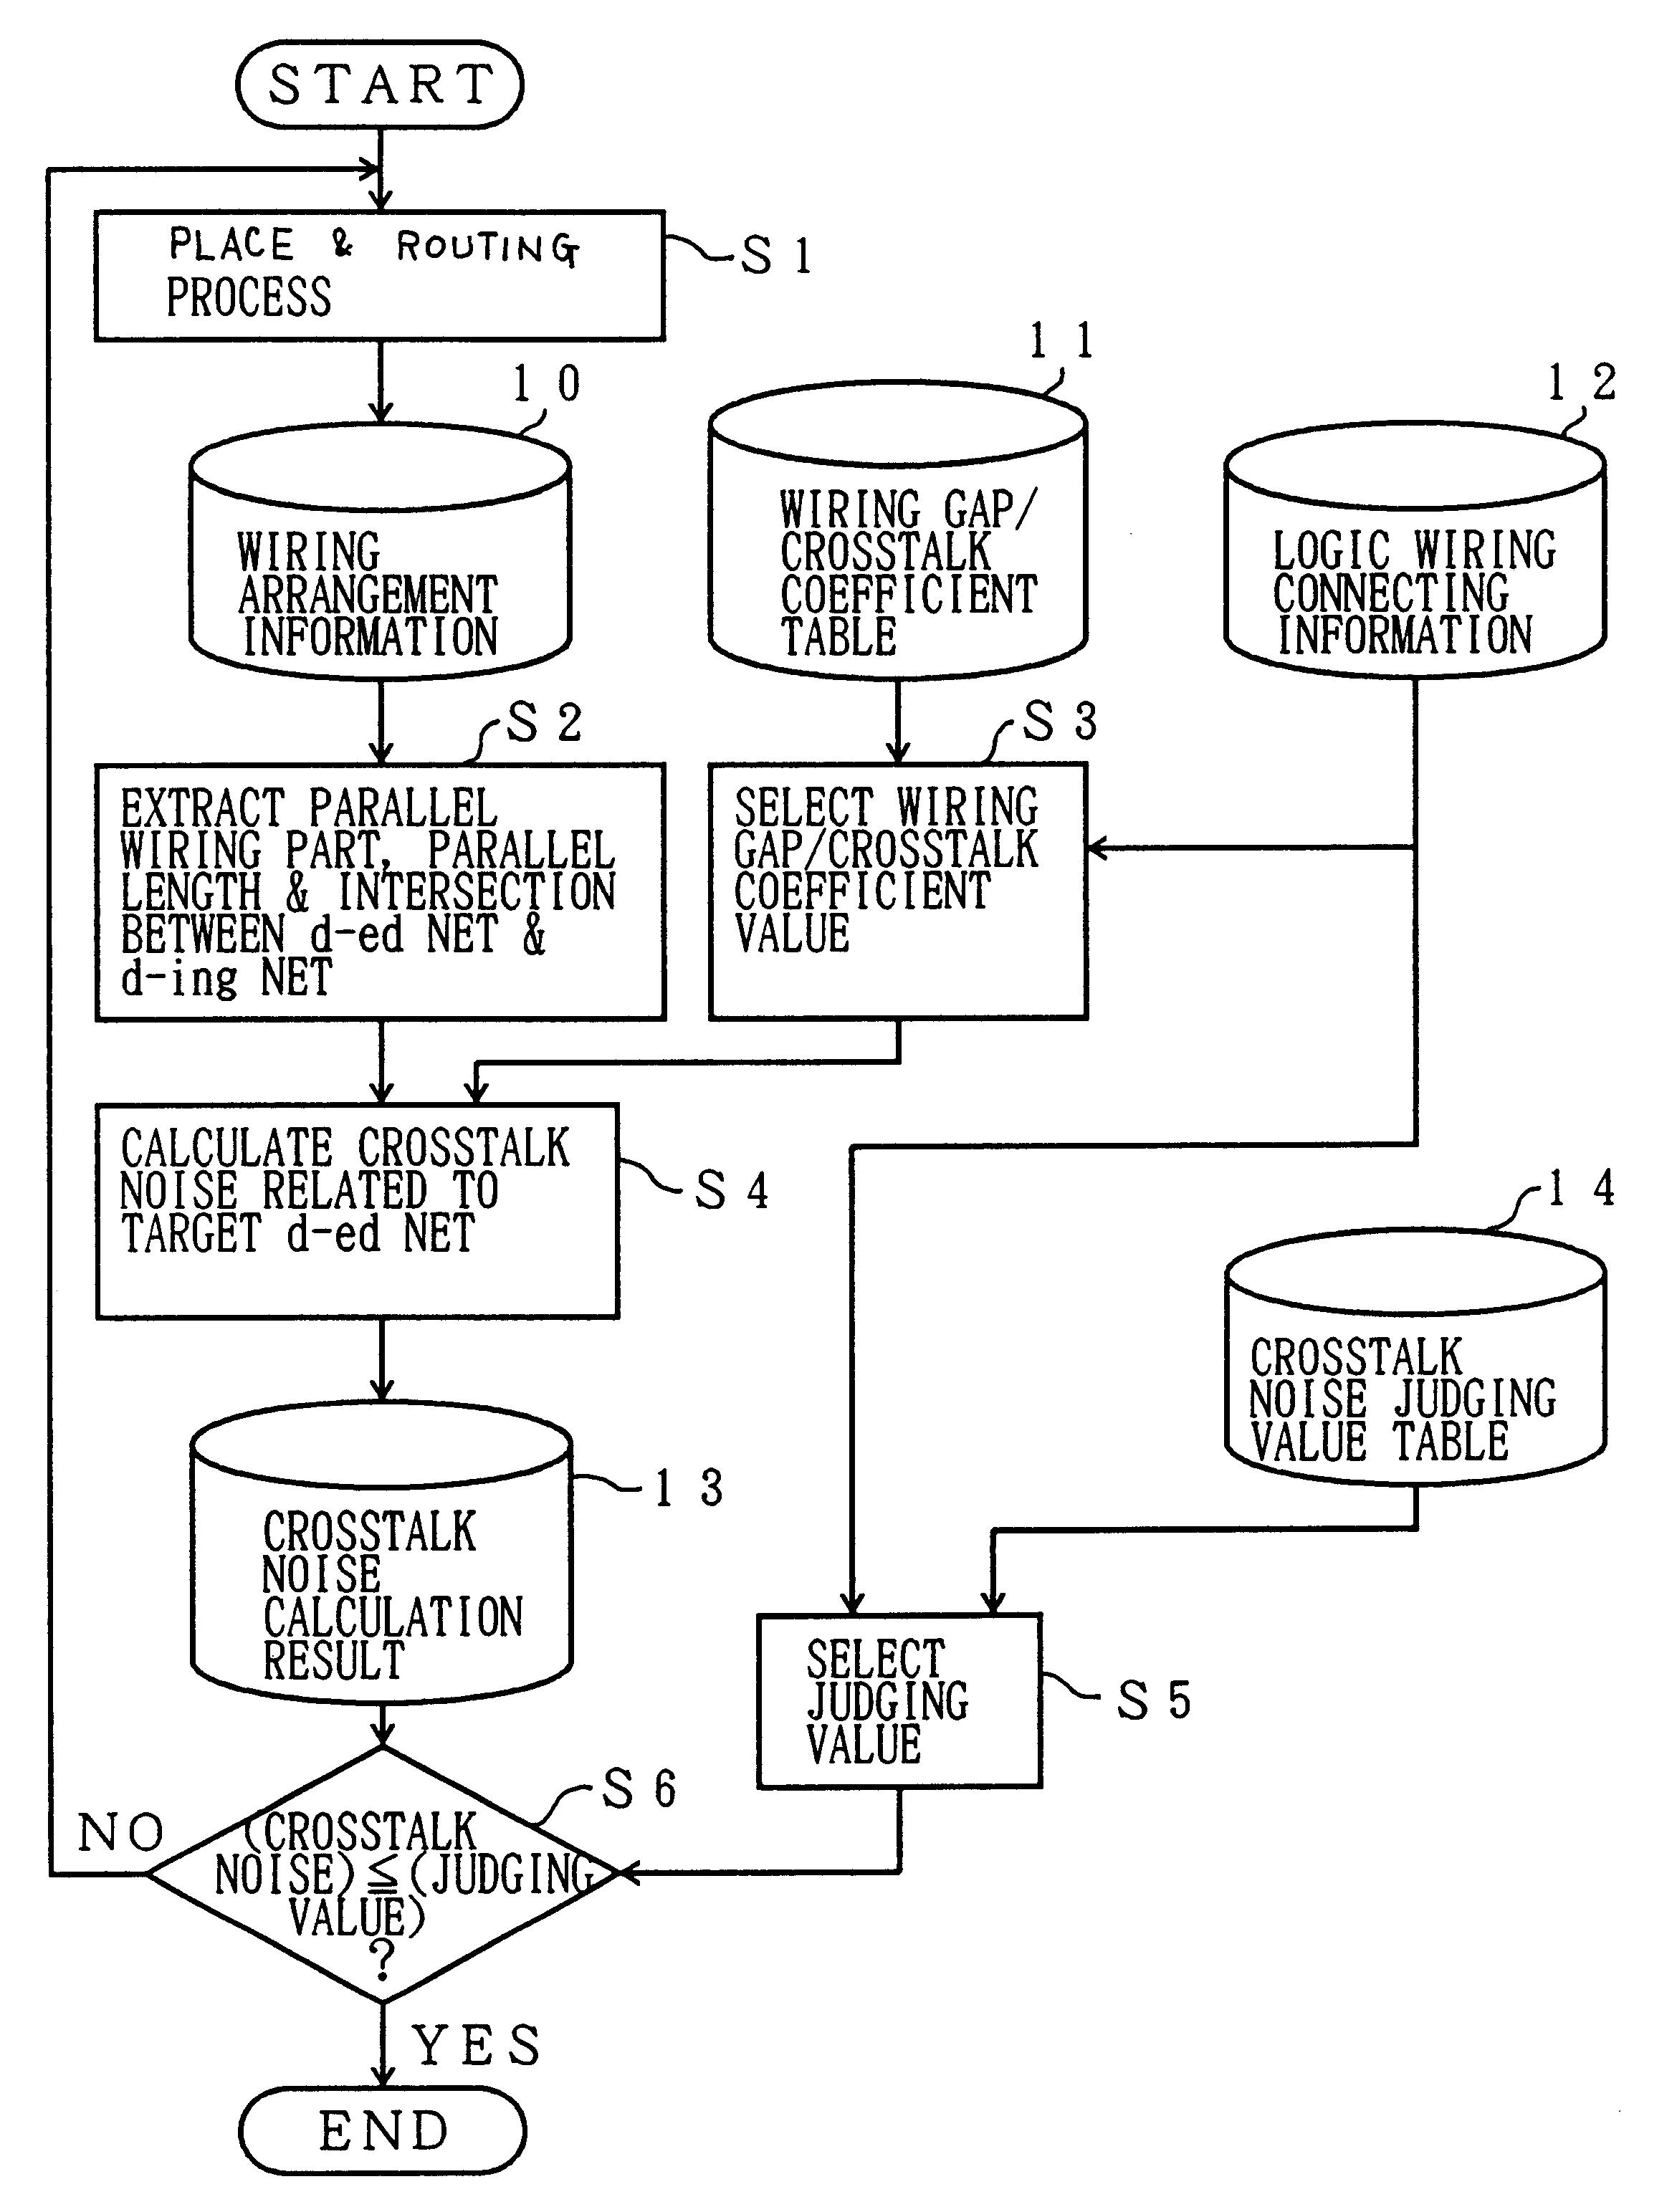 Brevet Us6278951 Crosstalk Noise Calculation Method And Storage Logic Diagram Calculator Patent Drawing